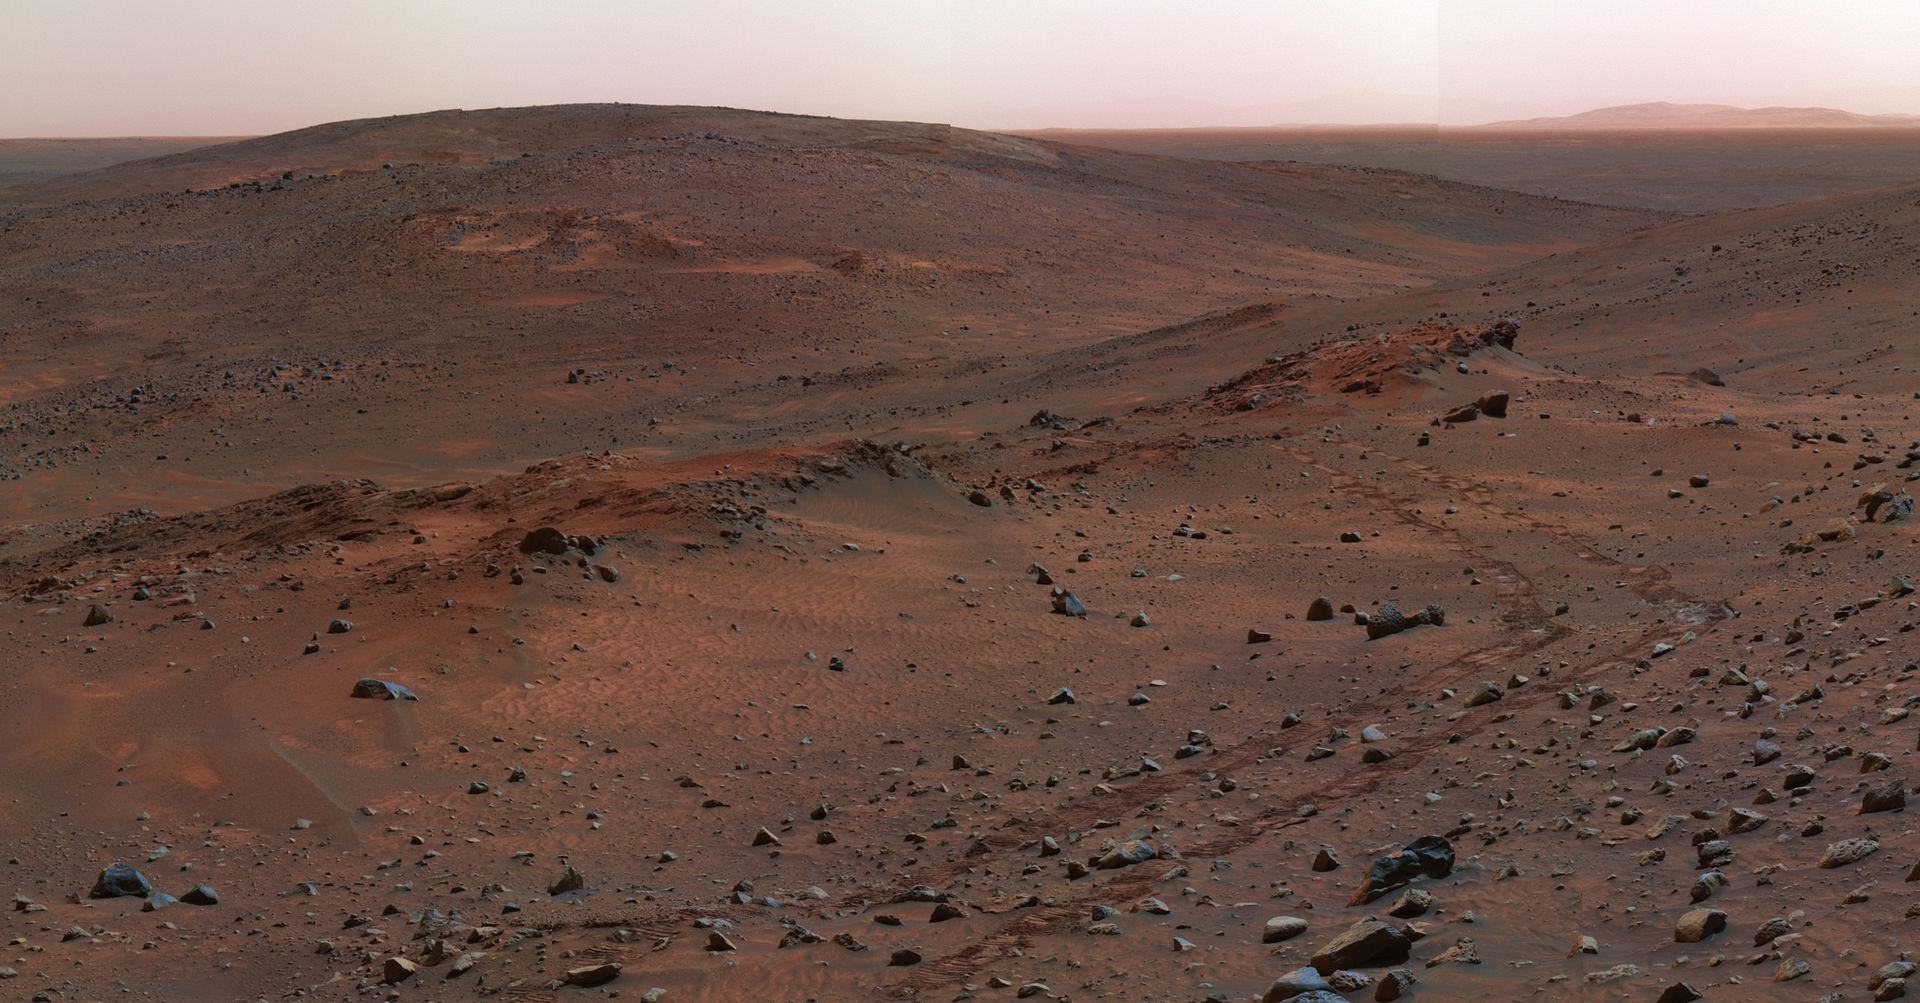 Vista de Marte (CC) Wikimedia Commons